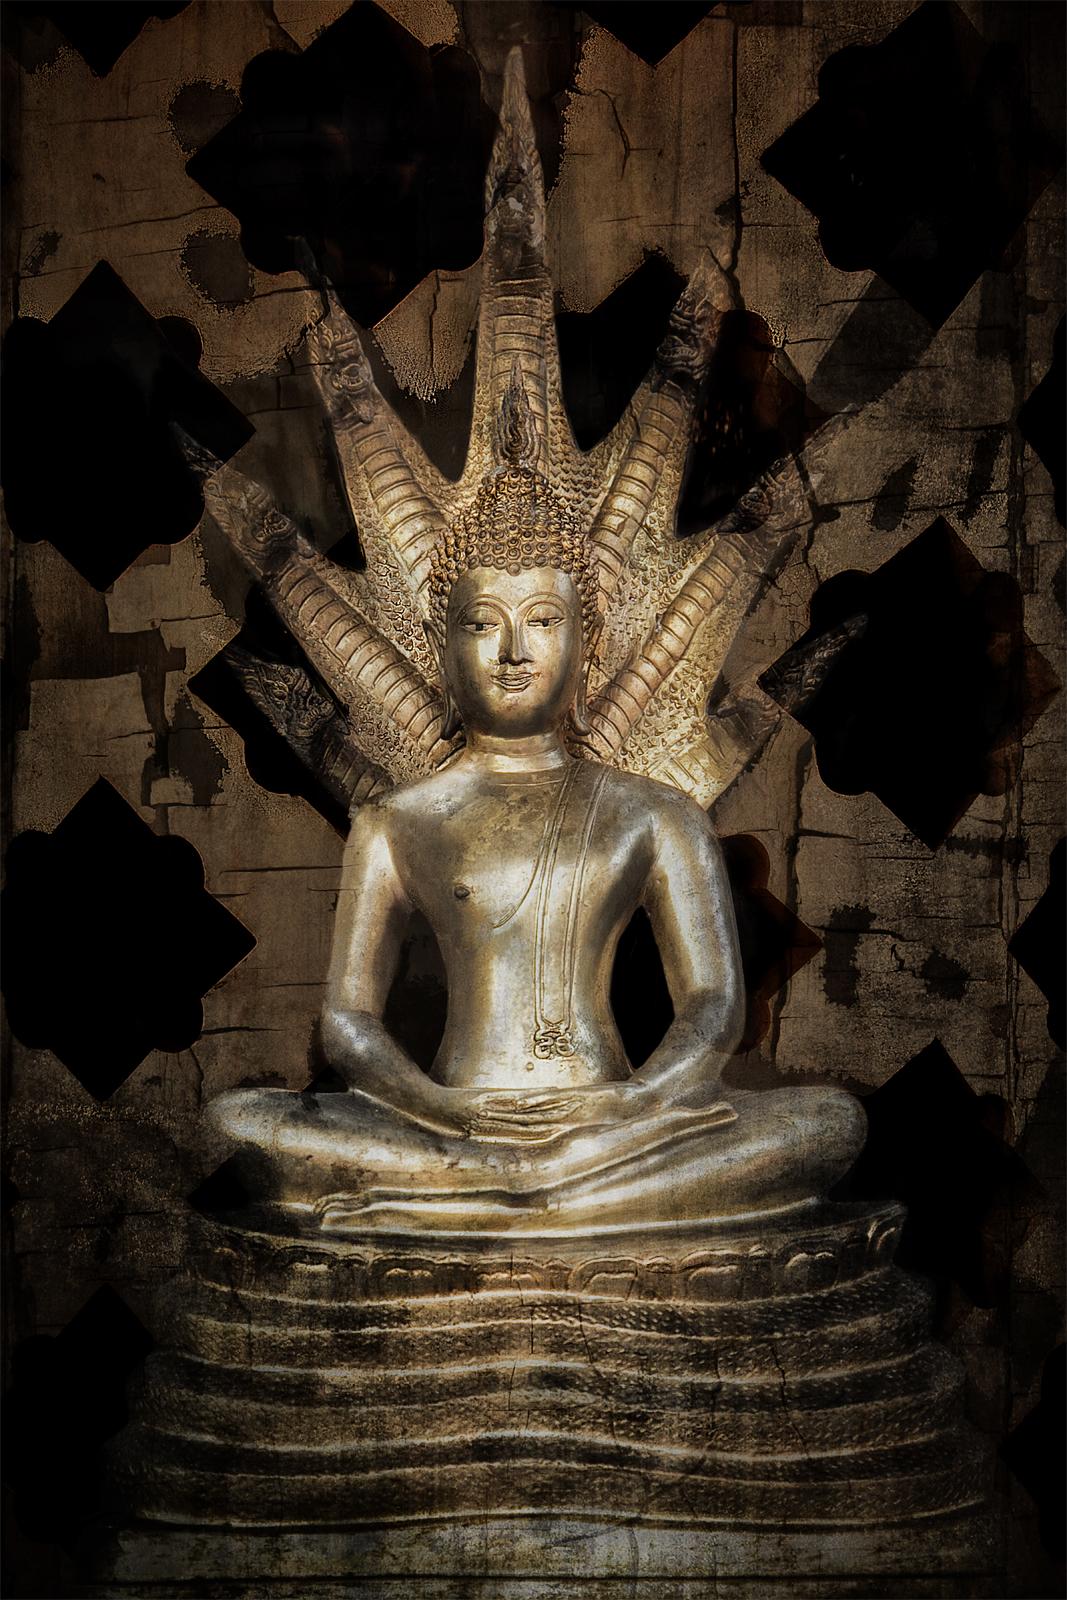 Thailand 3047 - Blackbox